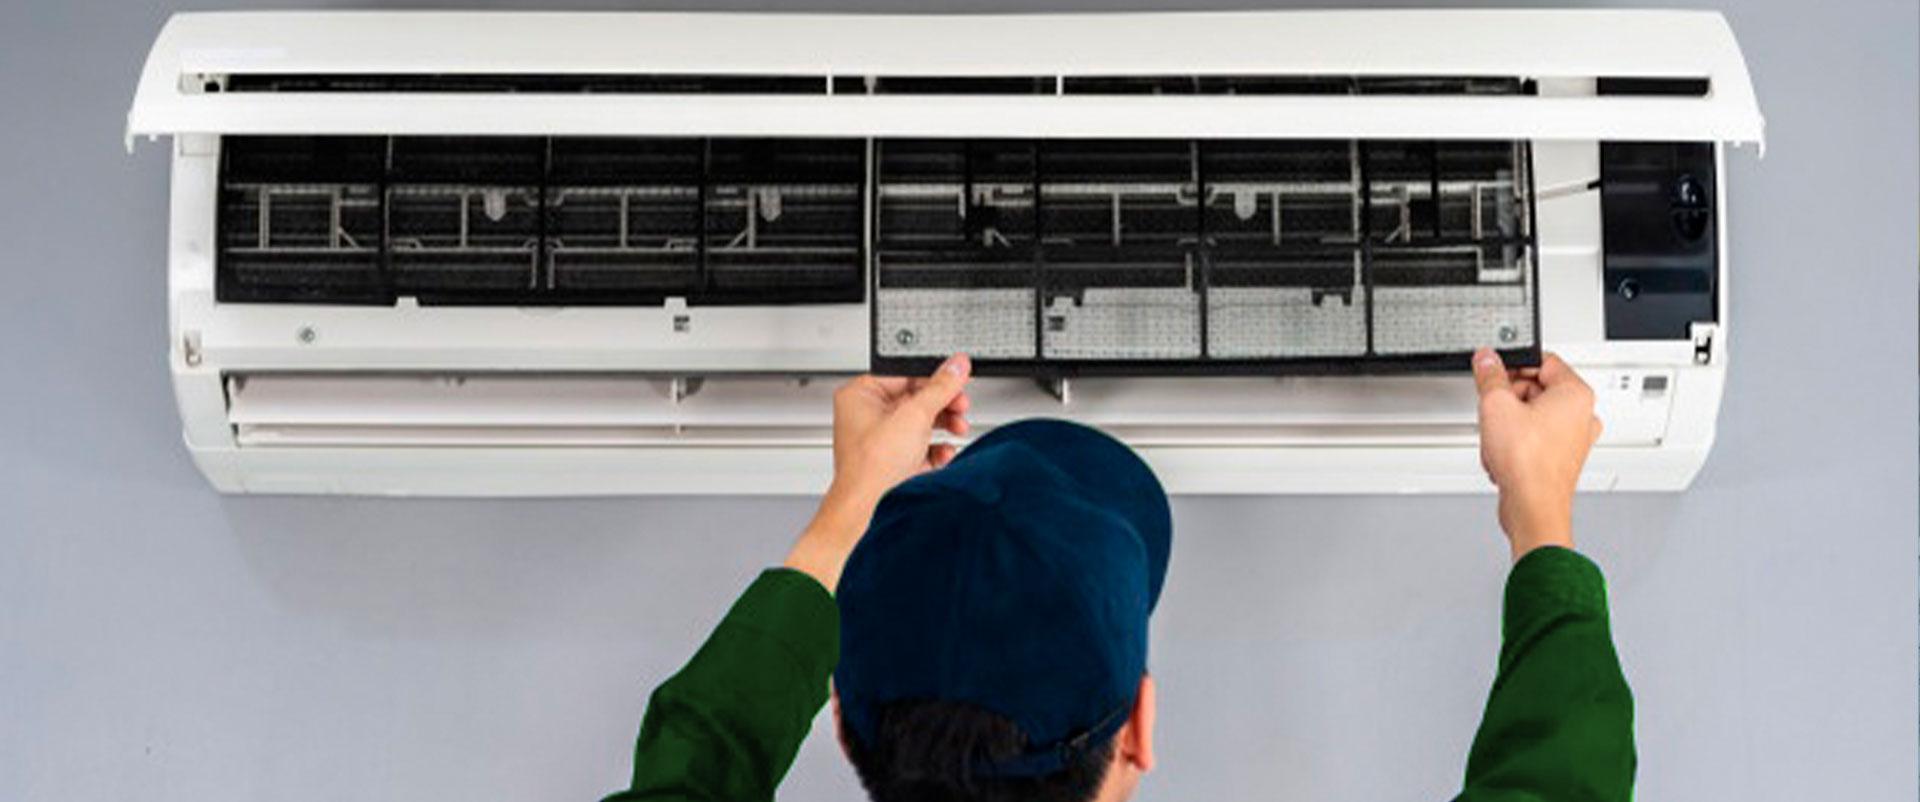 Aerotermia ahorro Valencia, Aerotermia energía renovable Valencia, Aerotermia en valencia